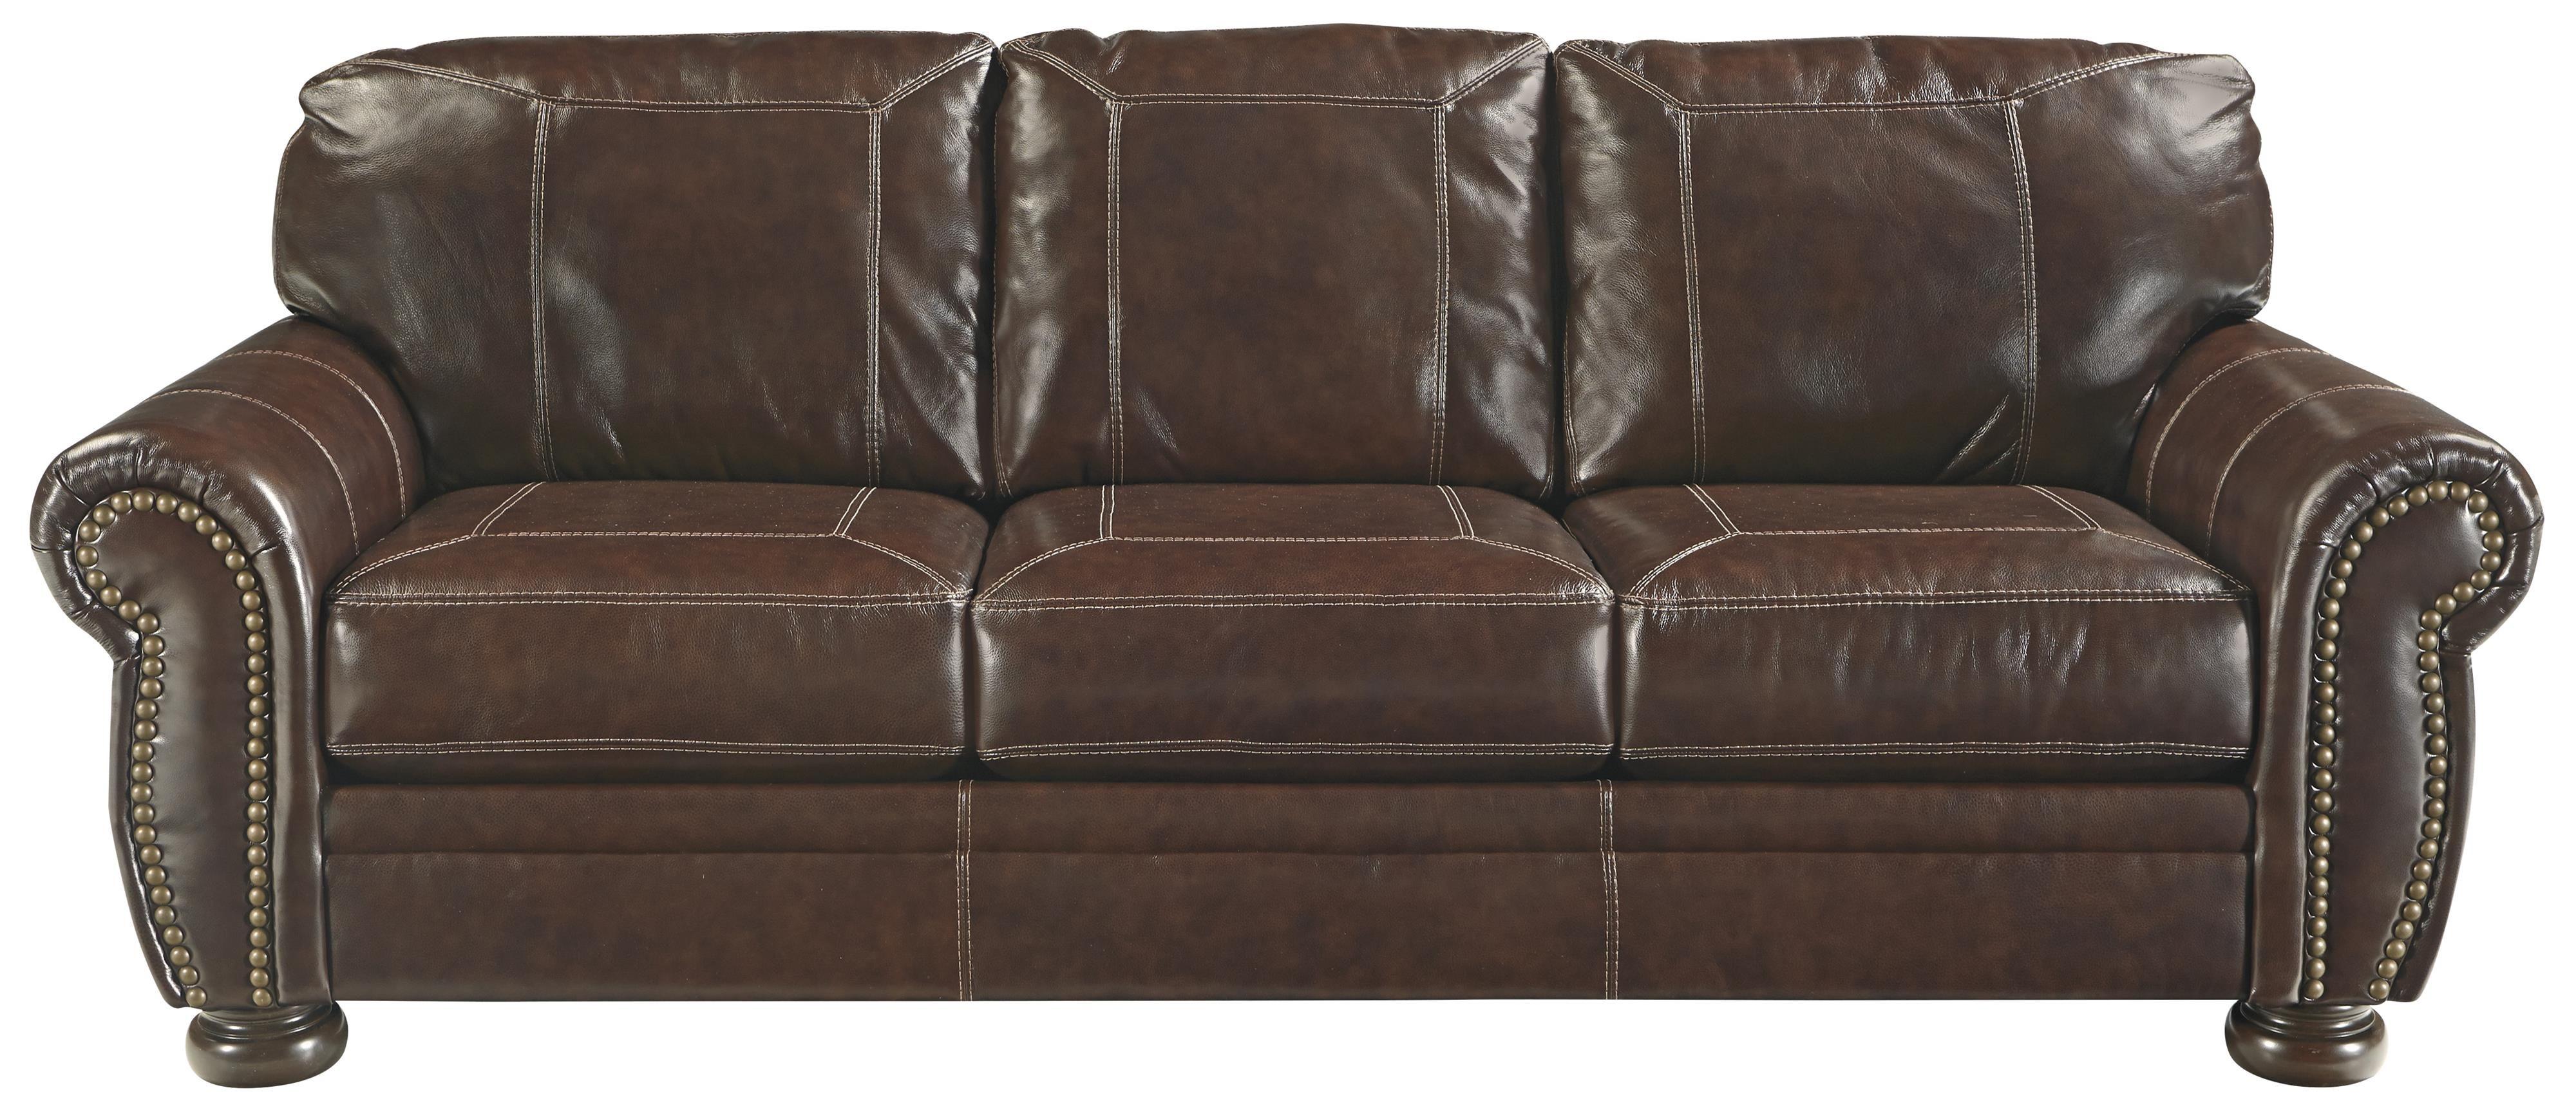 Banner Queen Sofa Sleeper By Signature Design By Ashley Leather Sofa Bed Signature Design Ashley